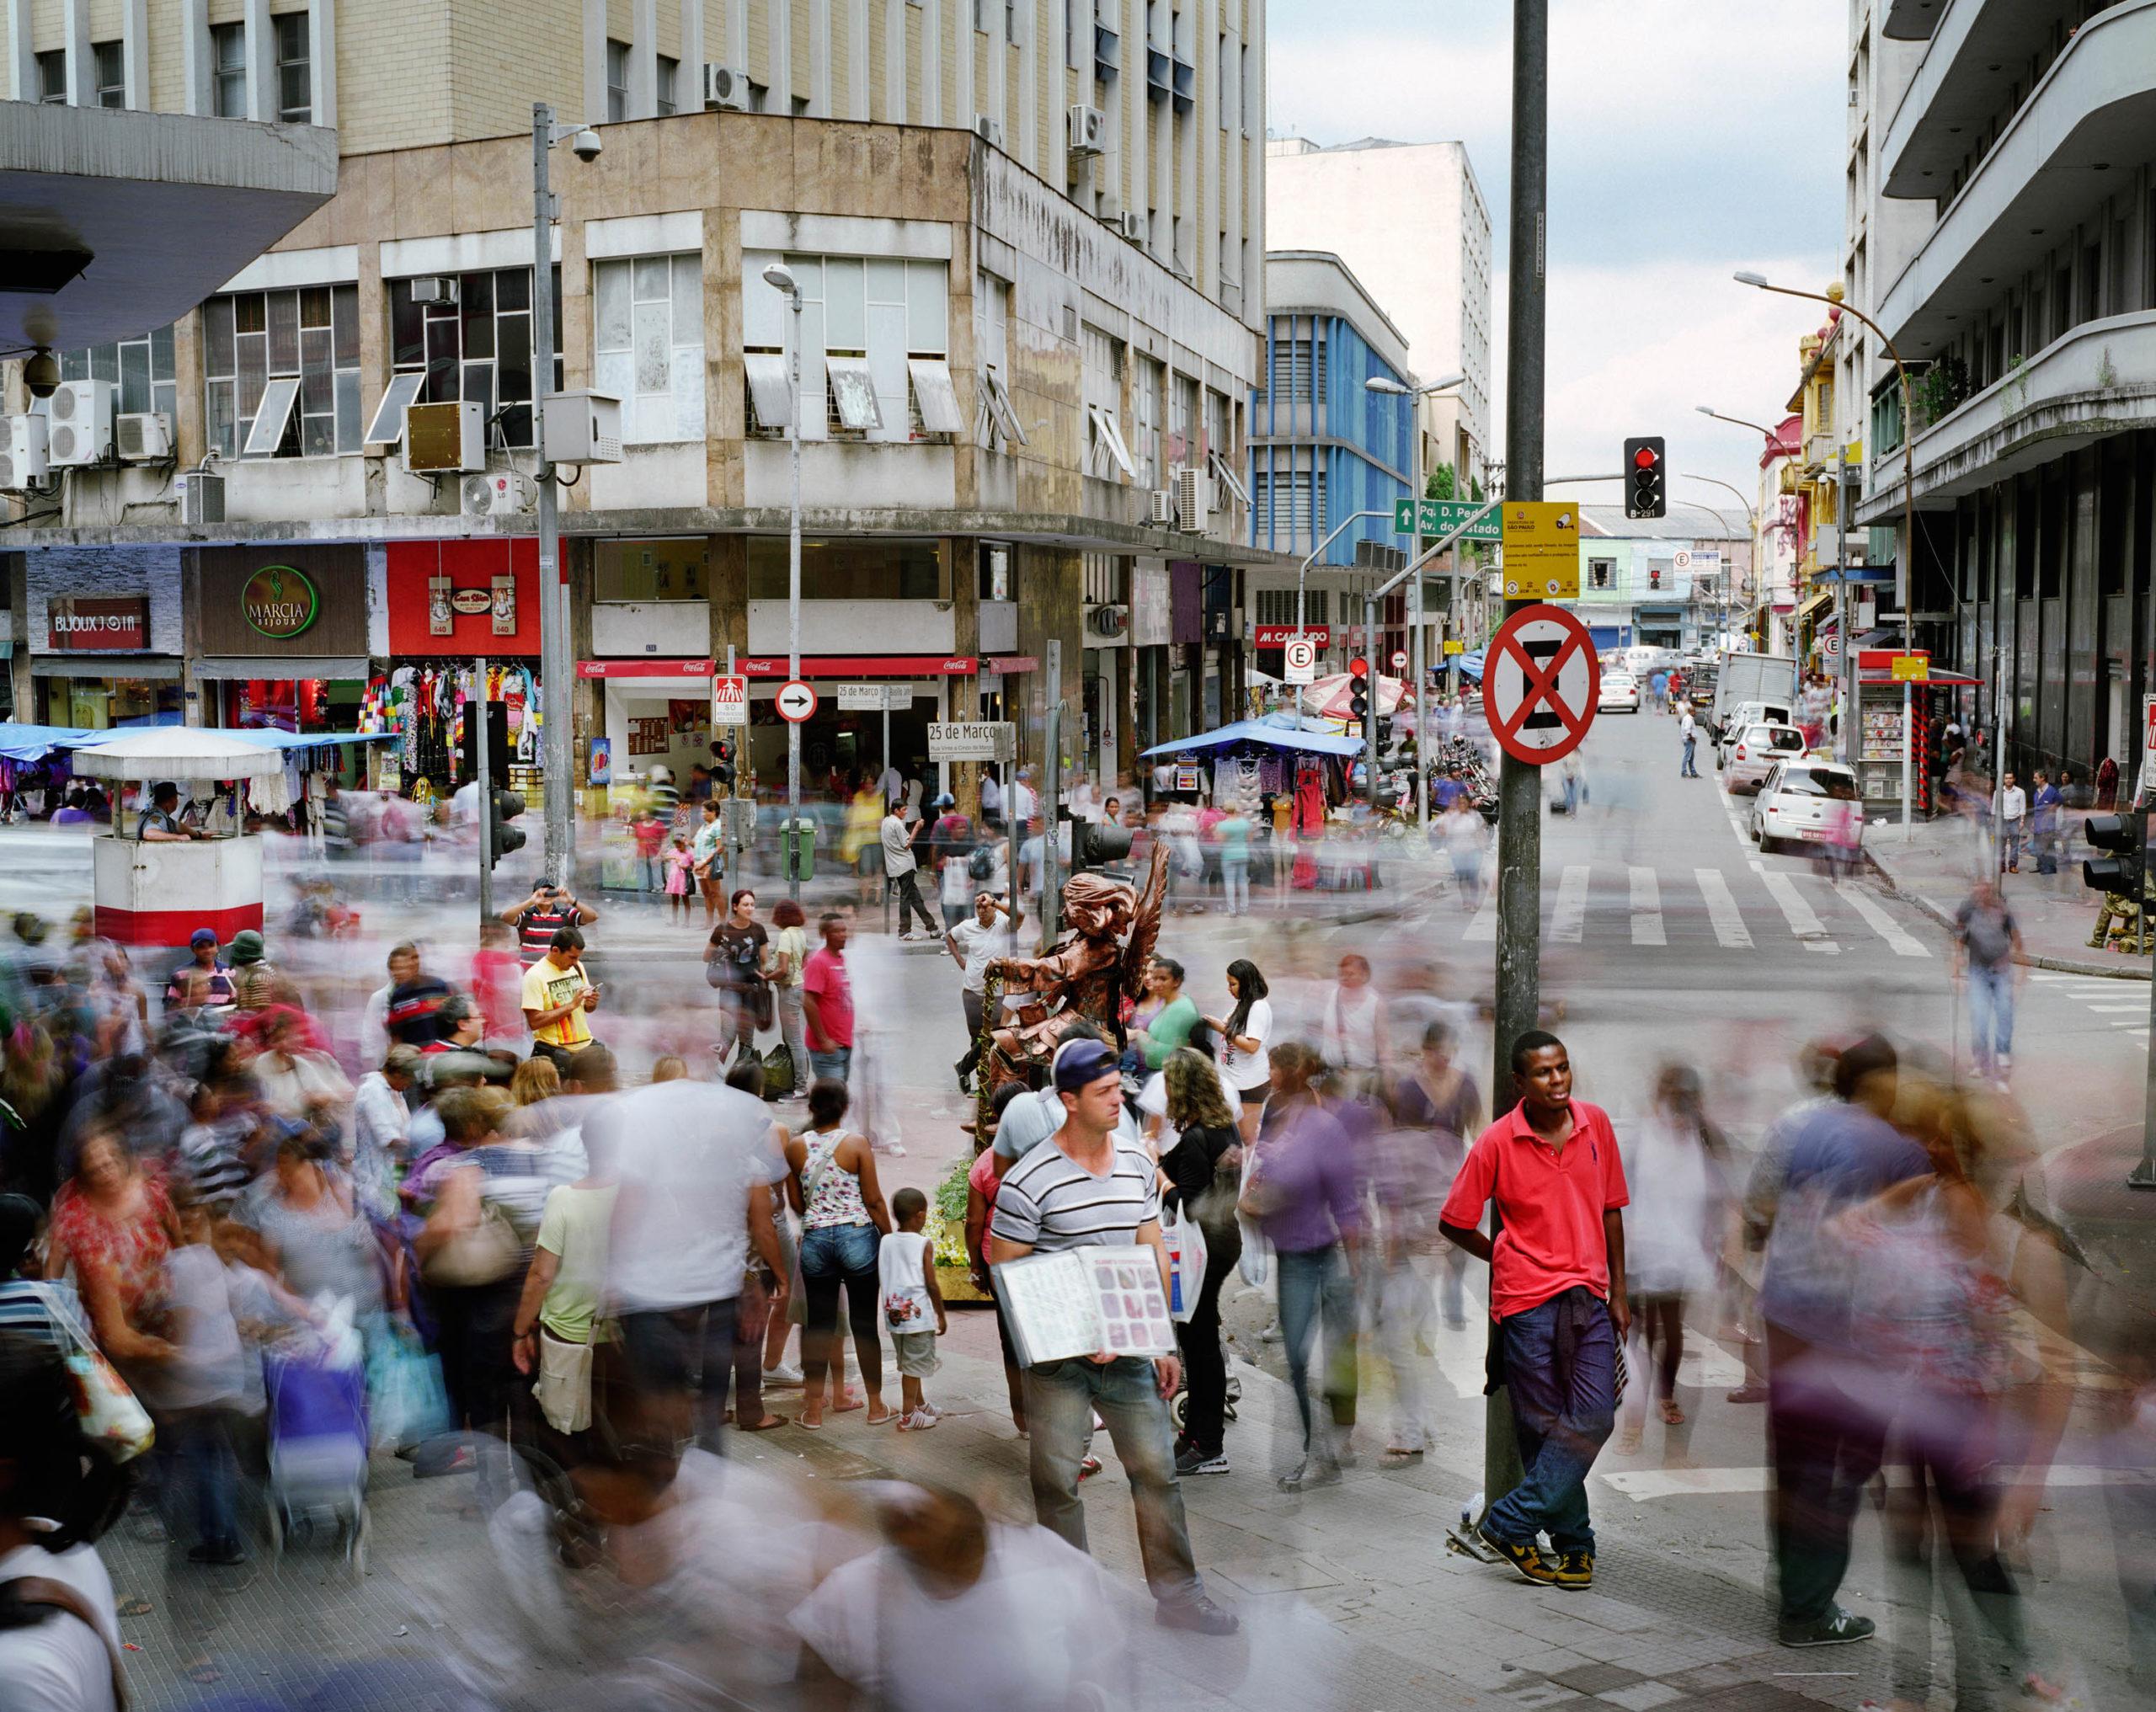 Rua 25 de Marco and Ladeira Porto Geral, Se, Sao Paulo, Brazil